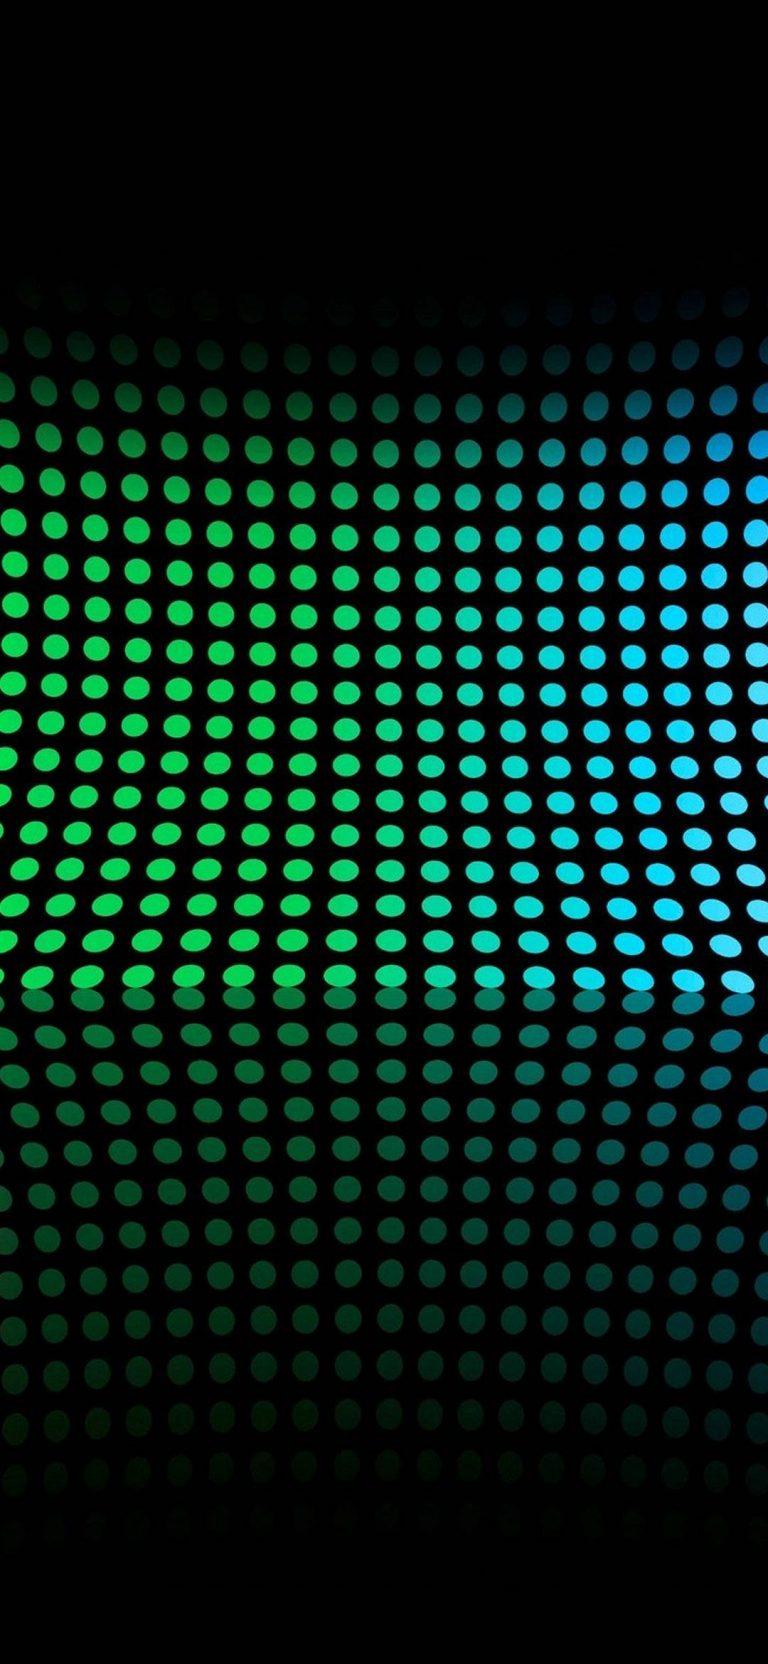 Abstract Multicolor Circles Rainbows 1080x2340 768x1664